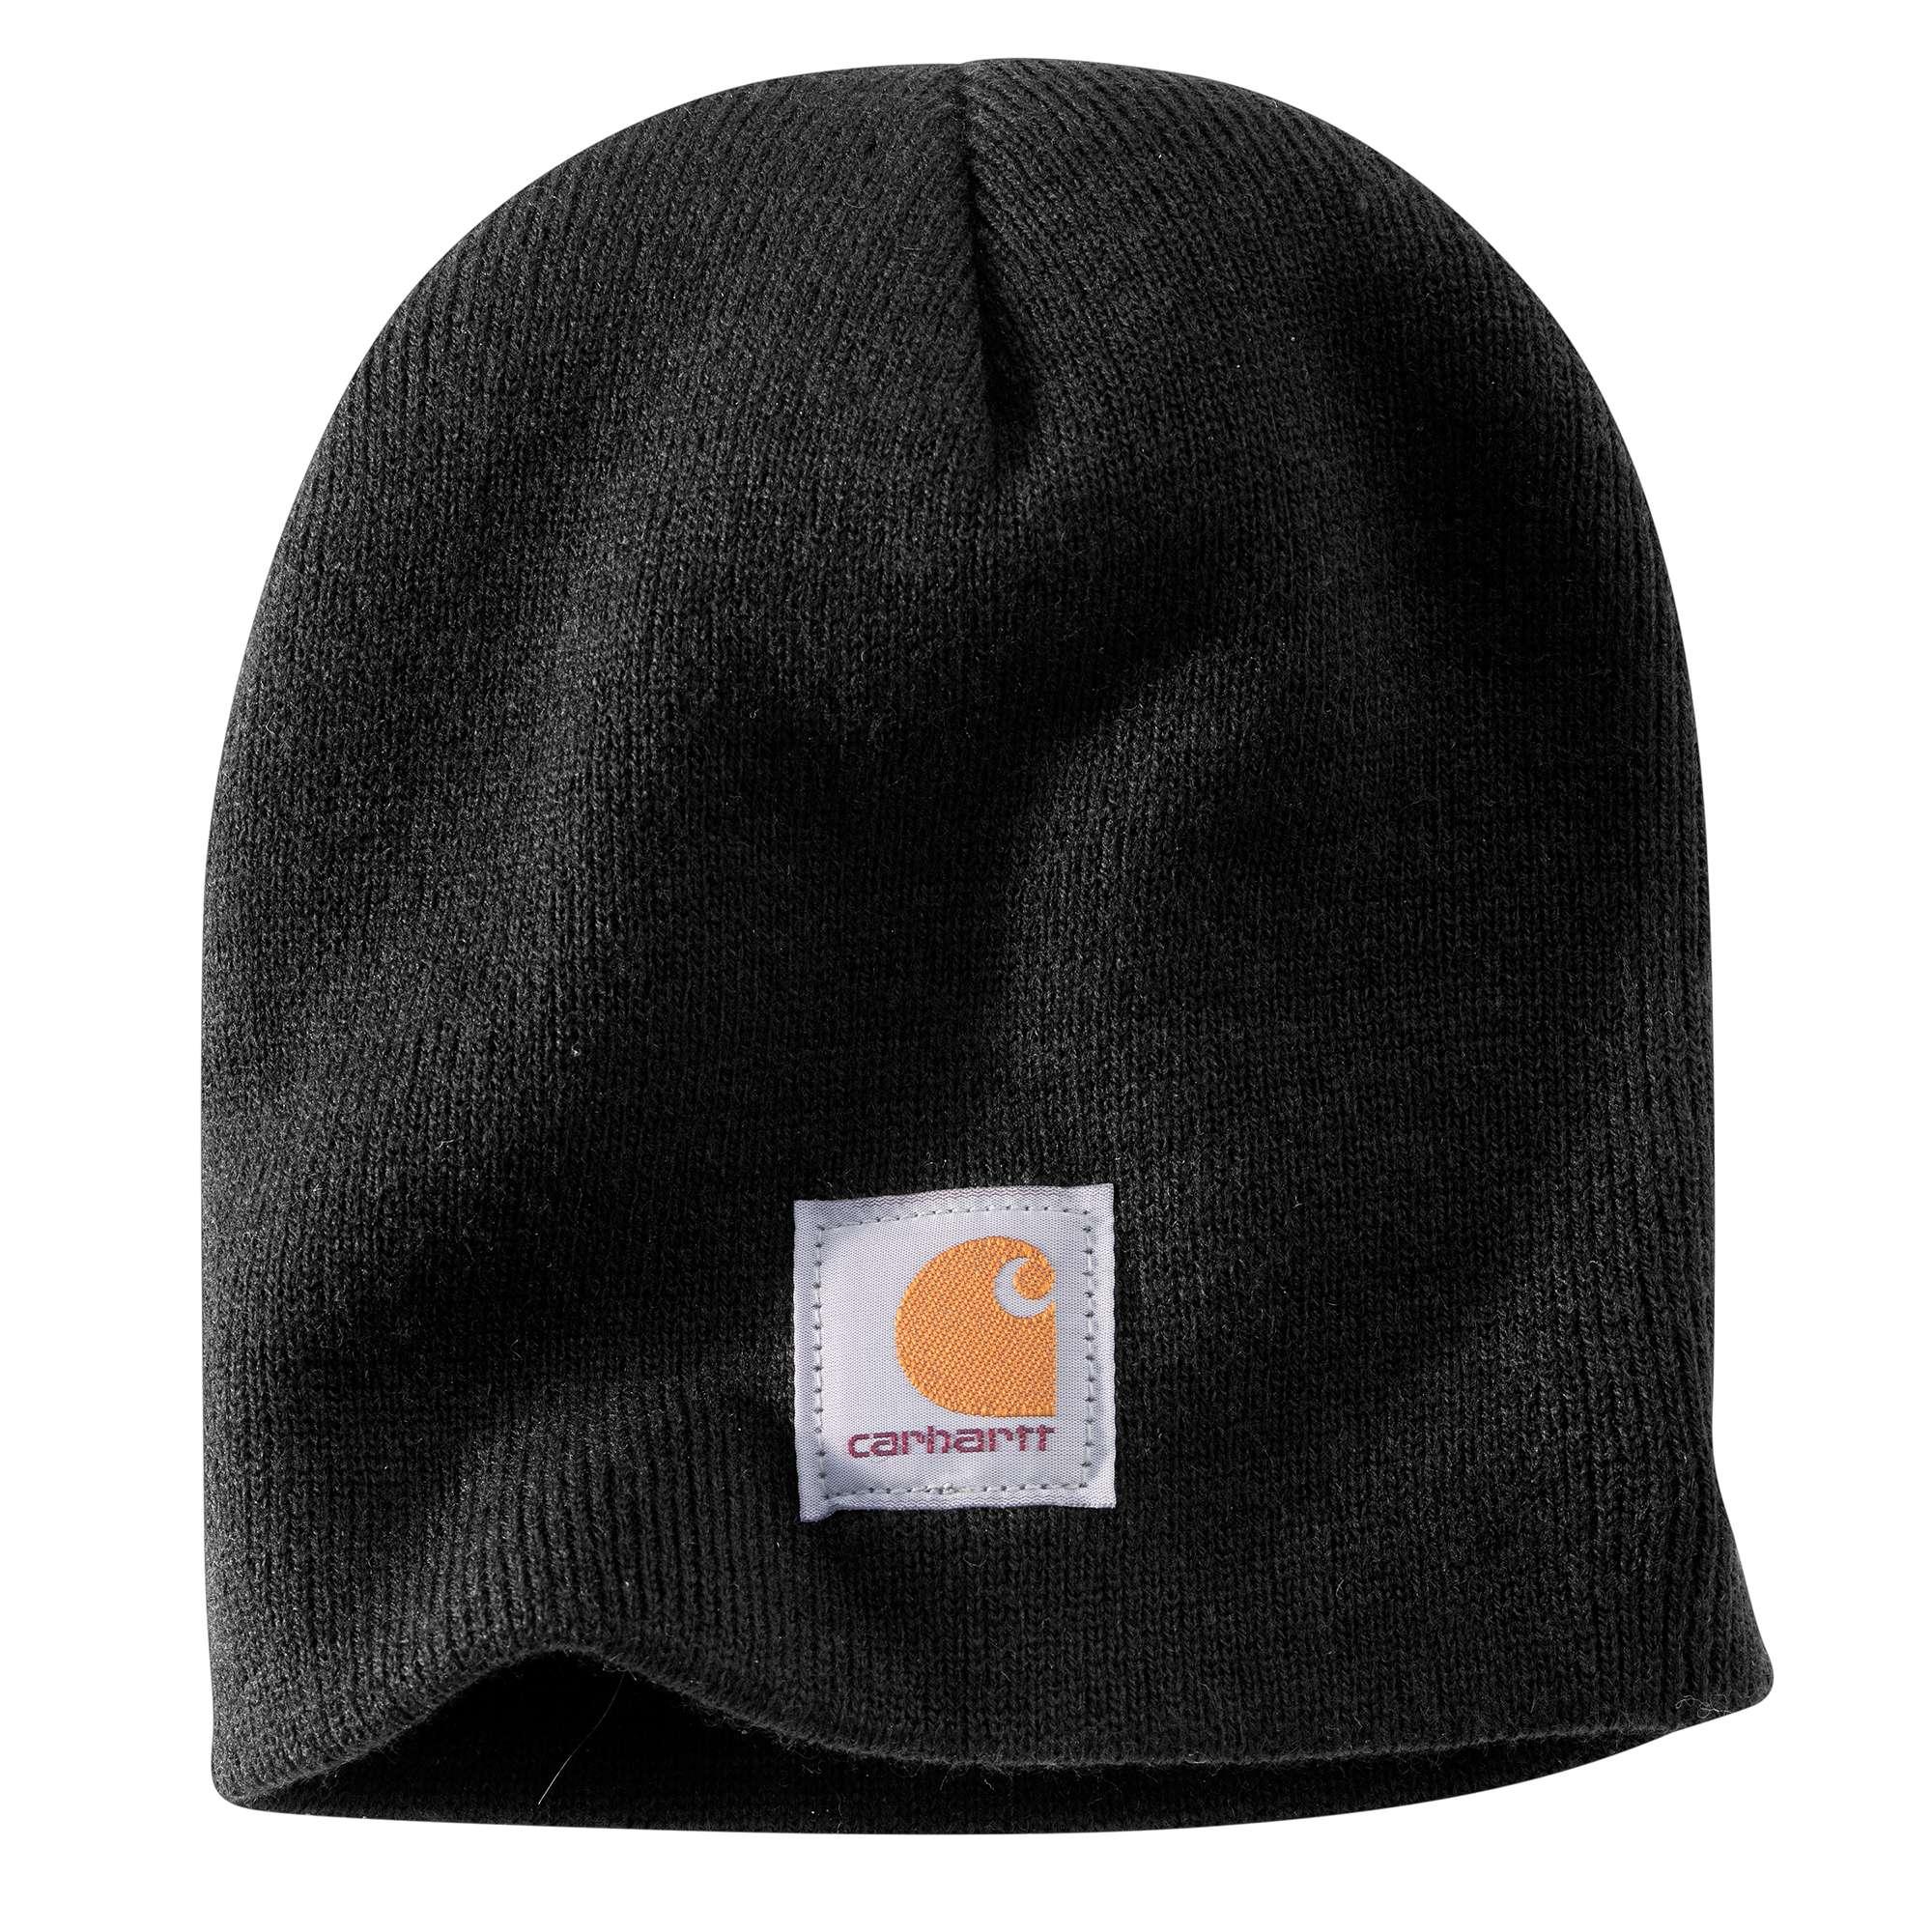 Acrylic Knit Hat, Black, swatch